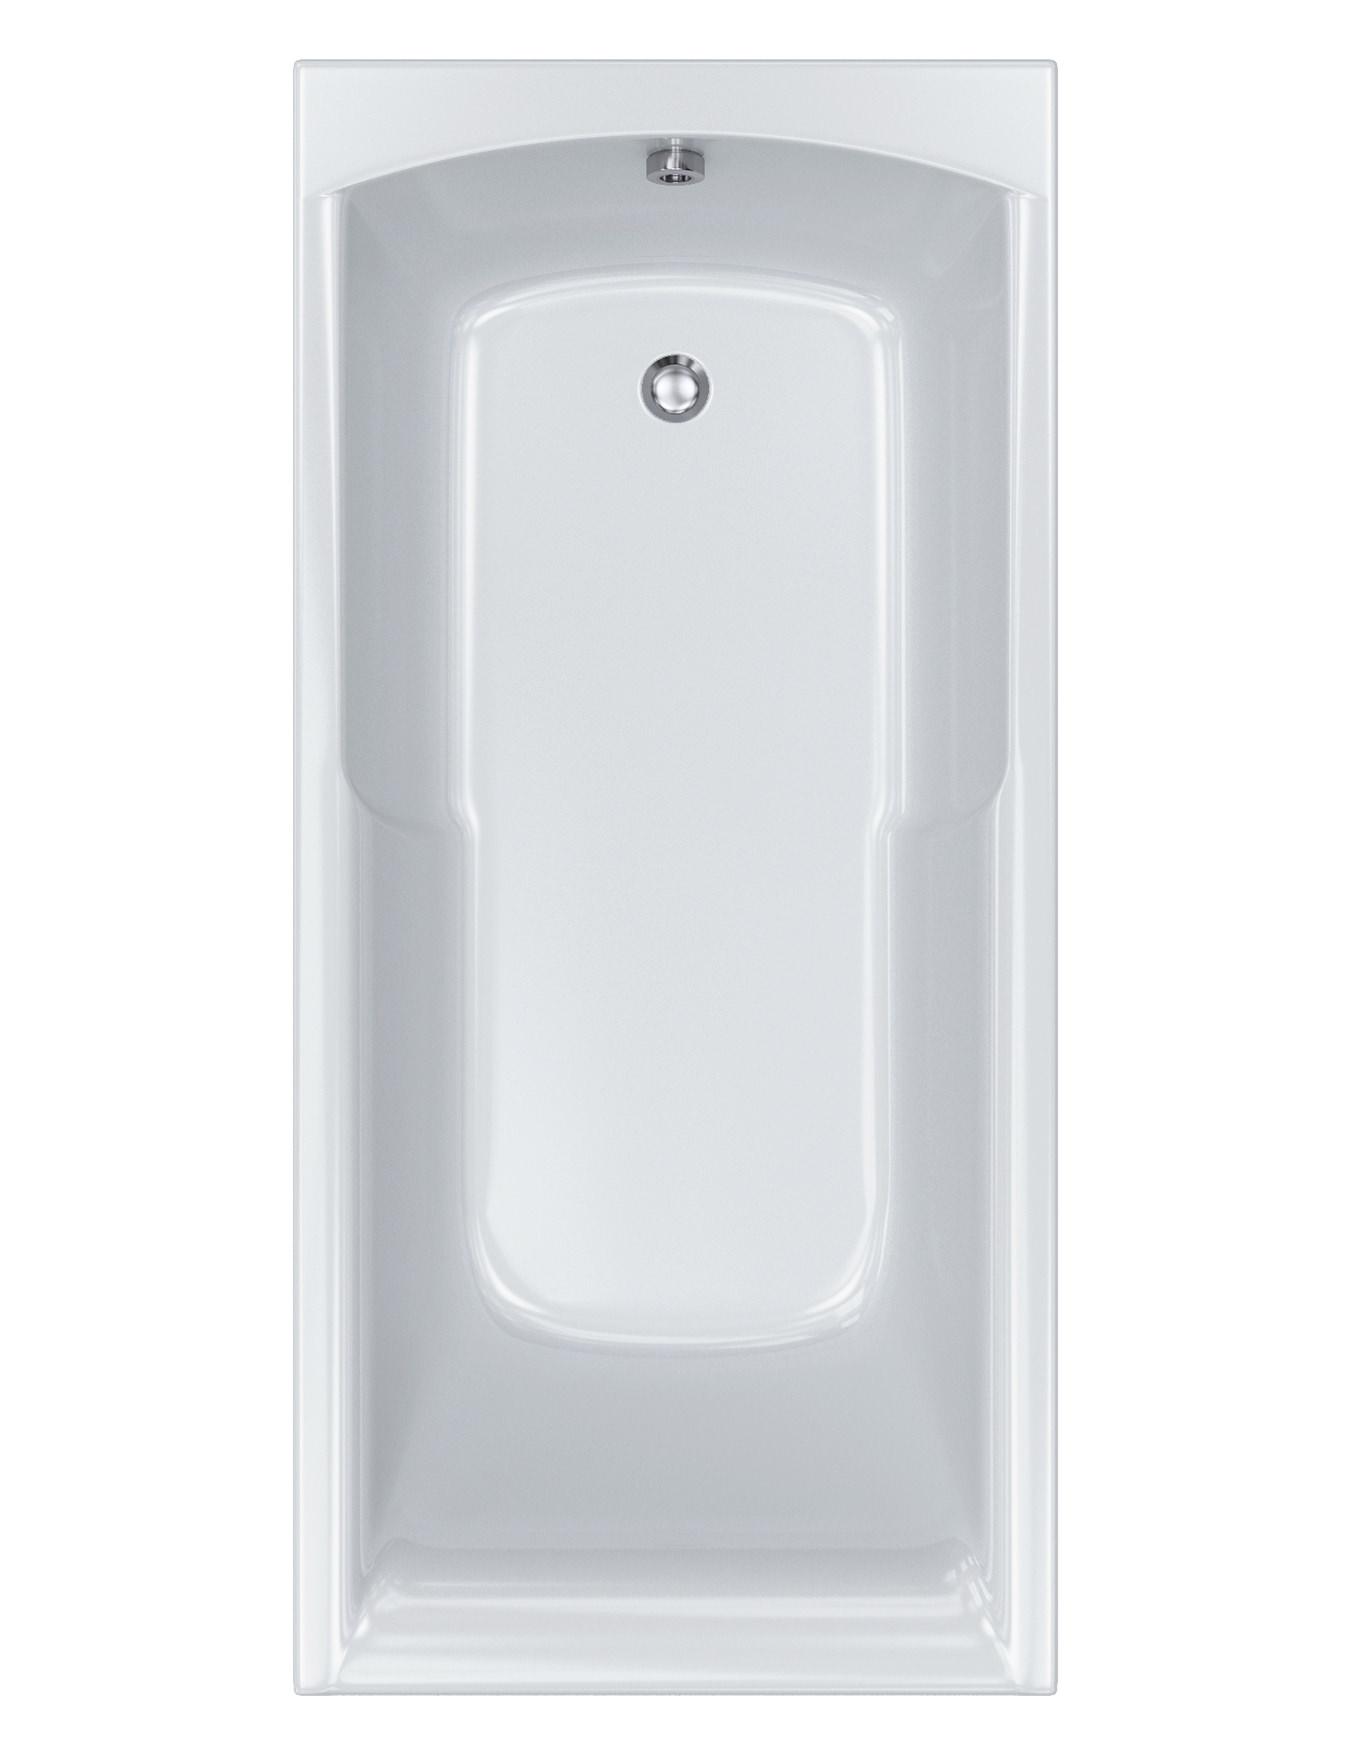 carron apex 5mm acrylic single ended shower bath 1700 x 800mm carron apex 5mm acrylic shower bath with handgrips 1700 x